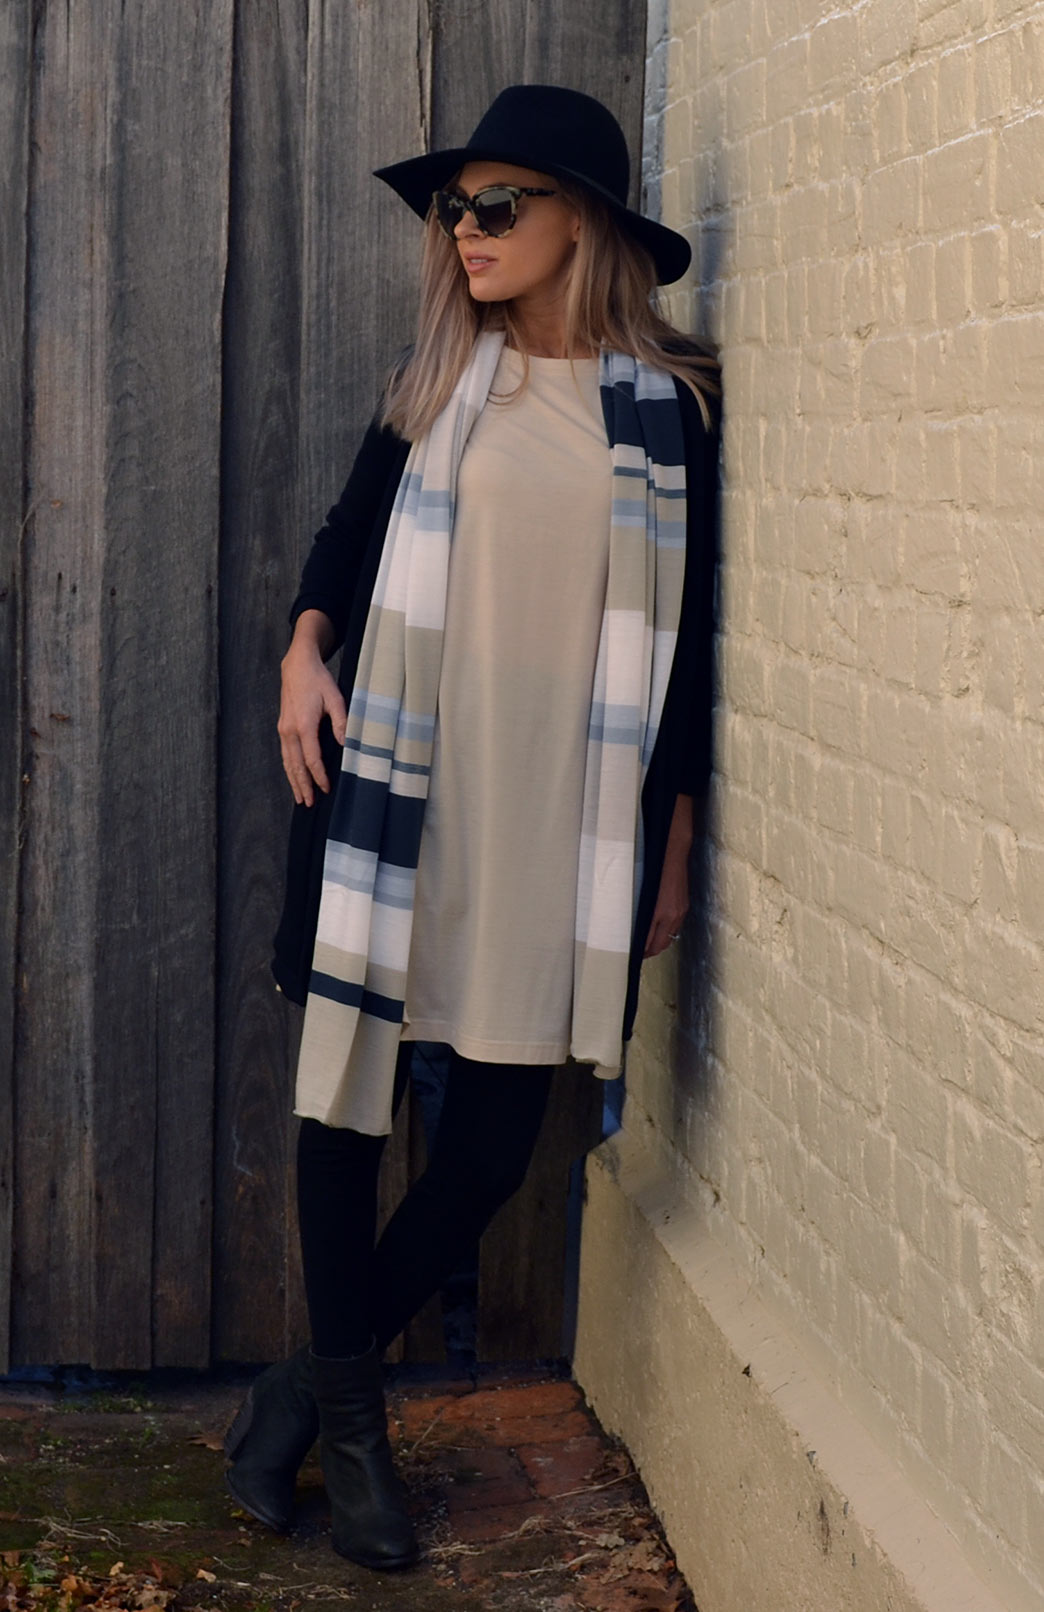 Scarves - Multi Striped - Women's Ivory and Steel Grey Multi Striped Wool Scarf - Smitten Merino Tasmania Australia